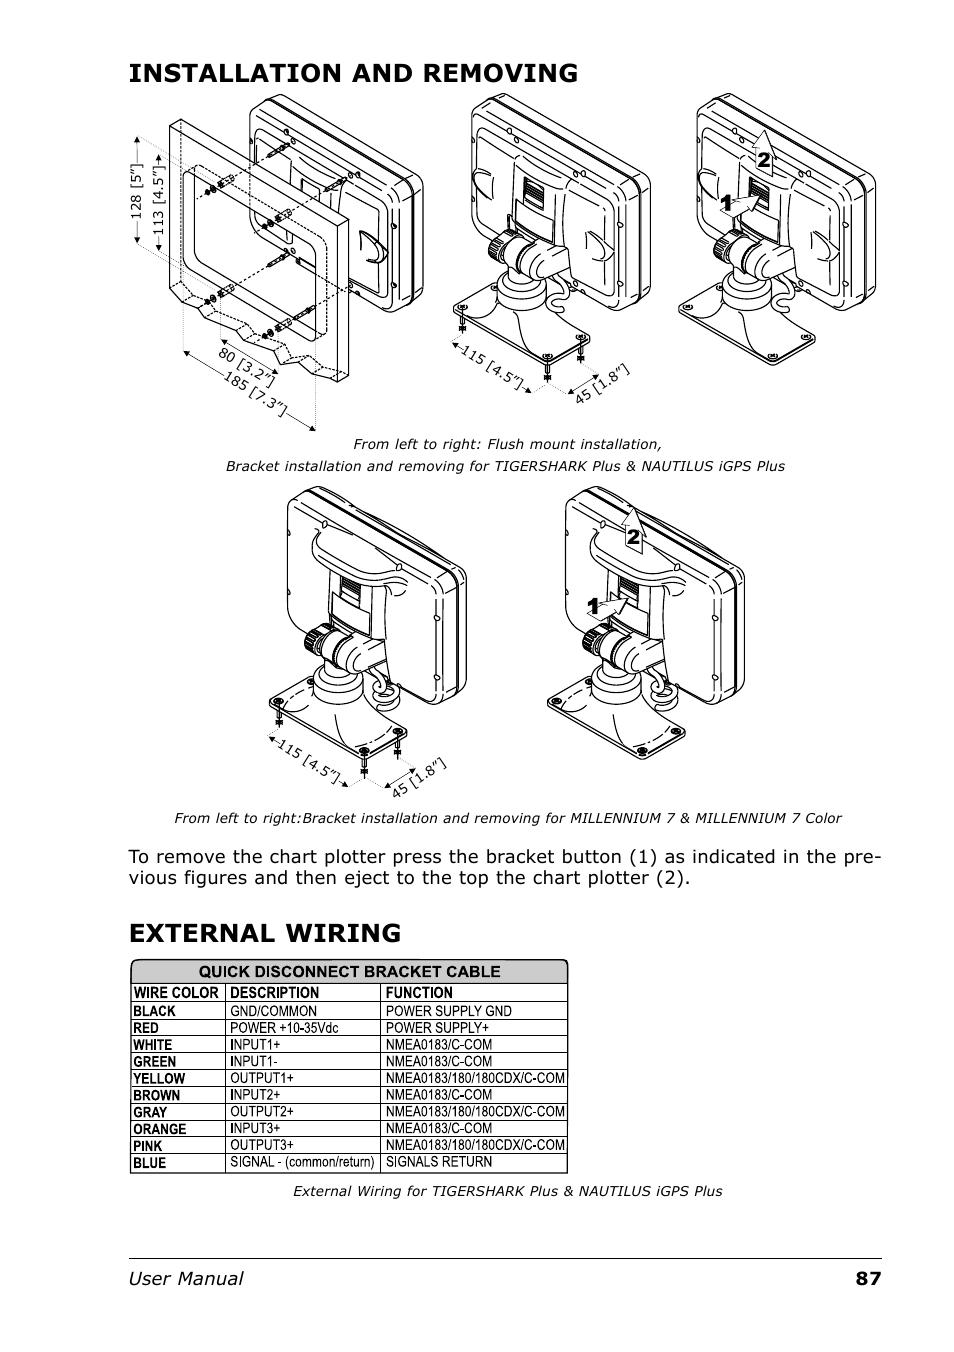 tiger shark wiring diagram schematic wiring diagram Tiger Shark Drawing